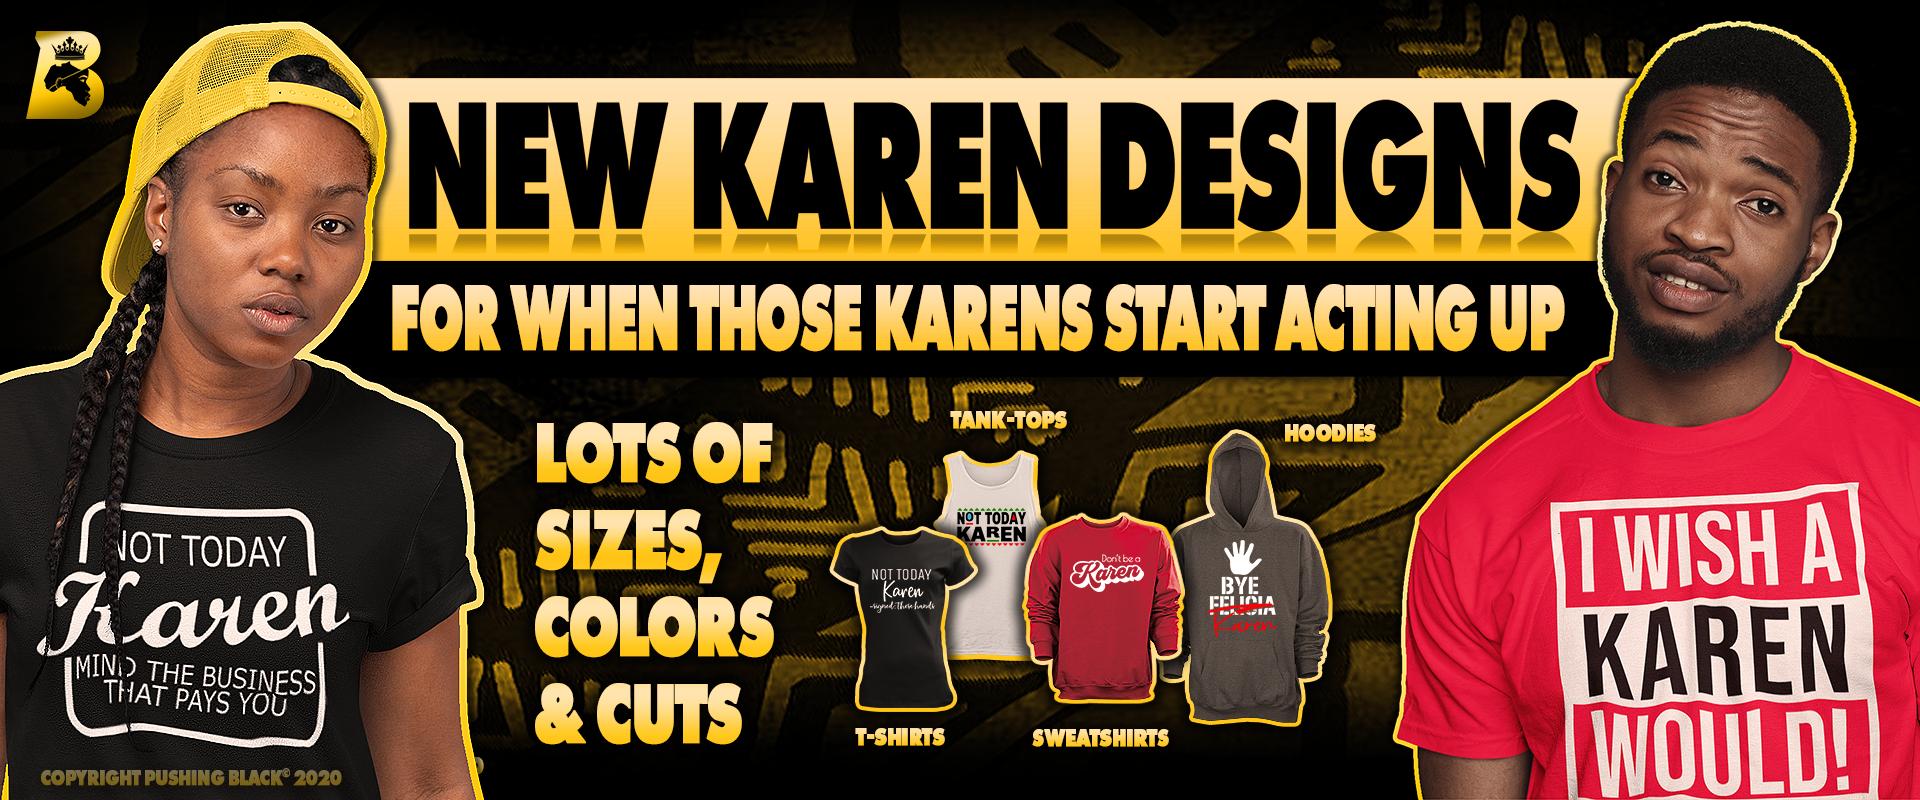 karen-designs-homepage.png